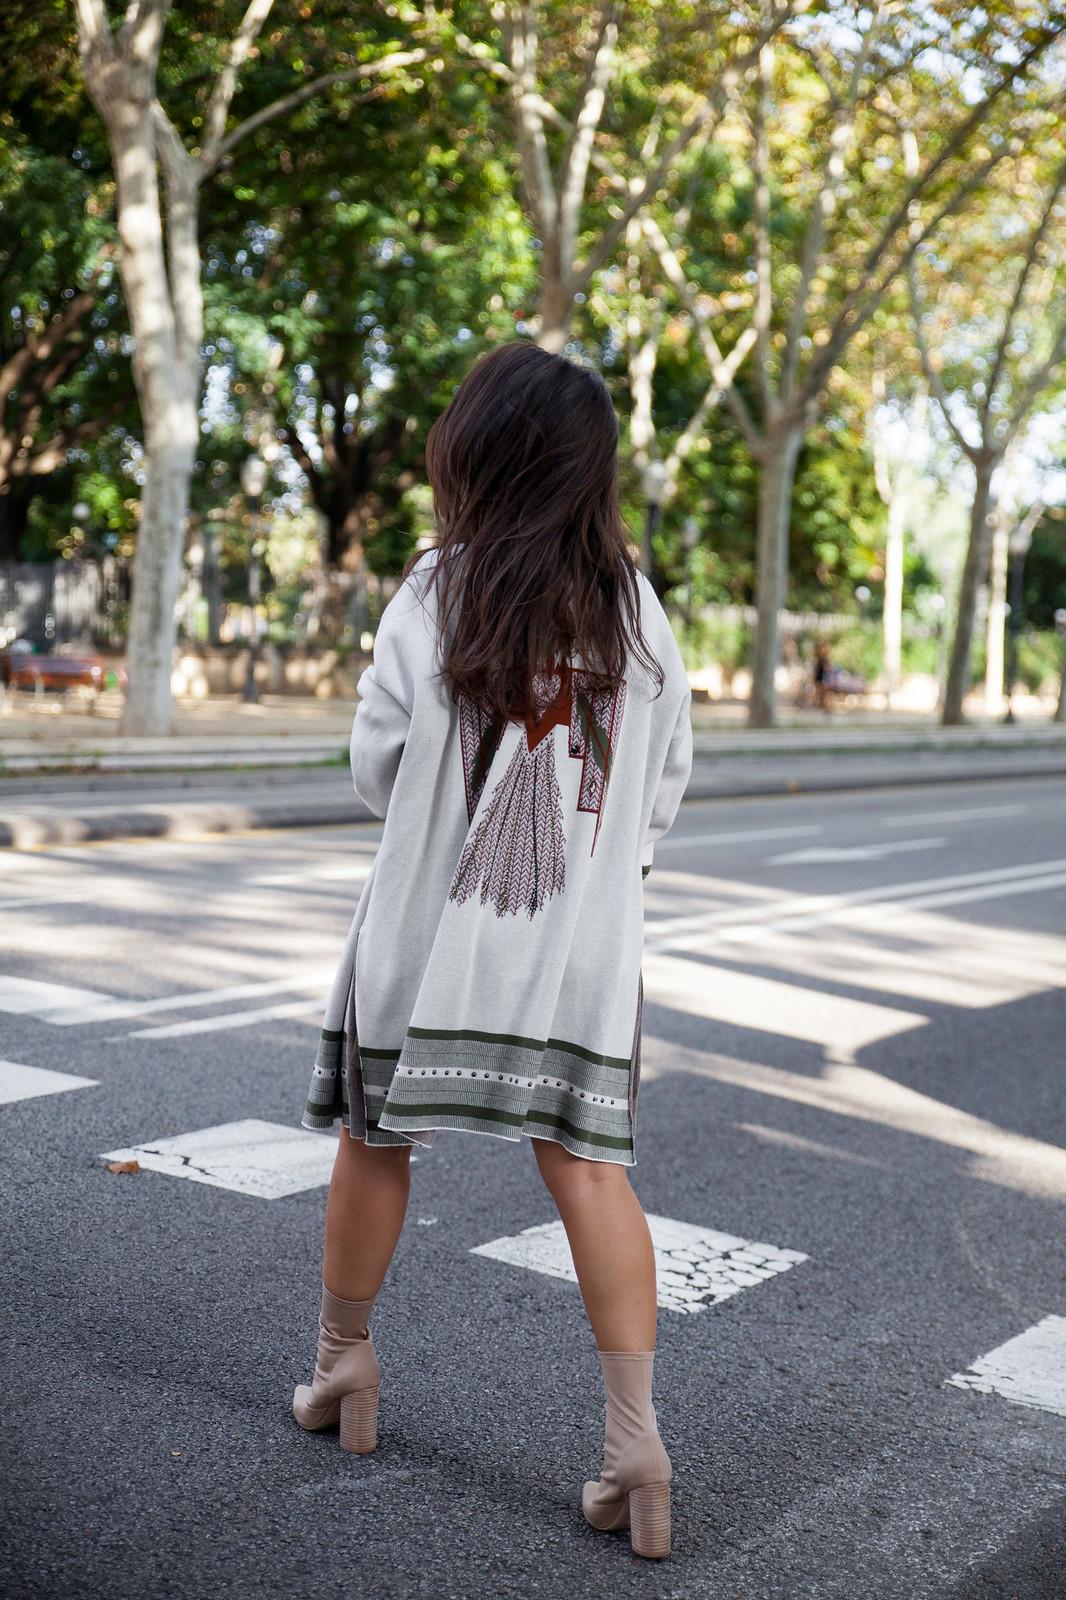 03_Como_combinar_un_cardigan_khaki_etnico_otoño_theguestgirl_rüga_laura_santolaira_influencer_embarazada_fashion_street_style_barcelona